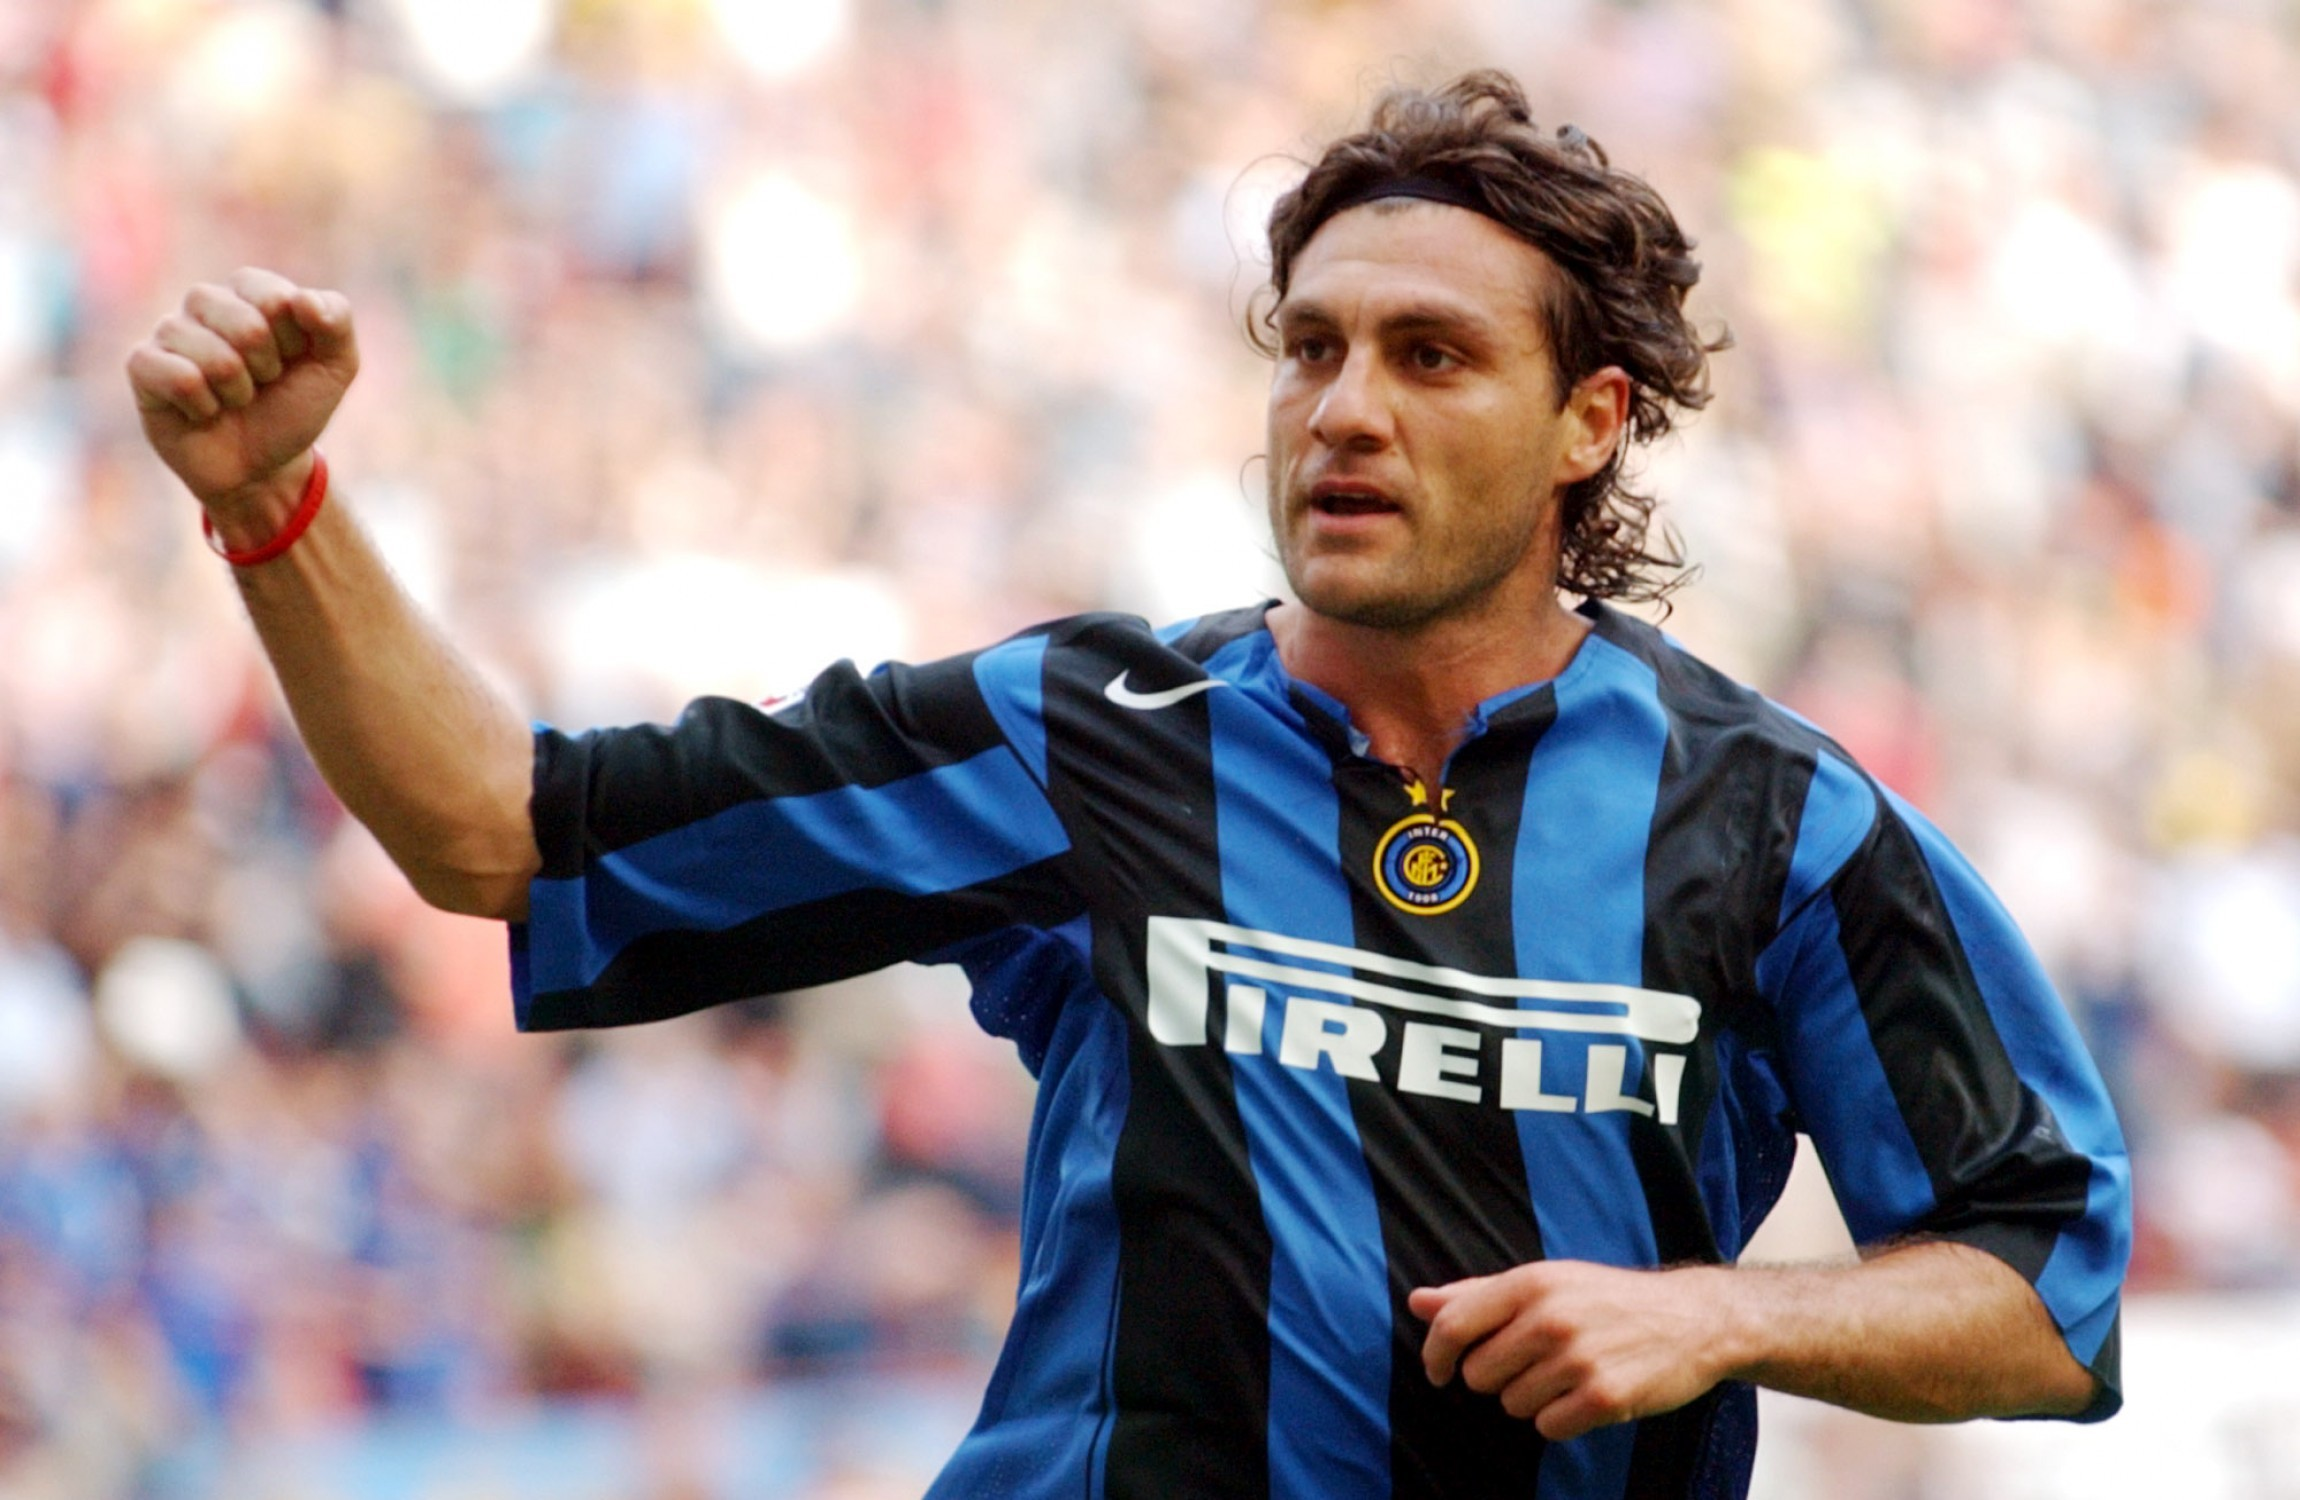 Legendary Italian striker Christian Vieri planning to make playing